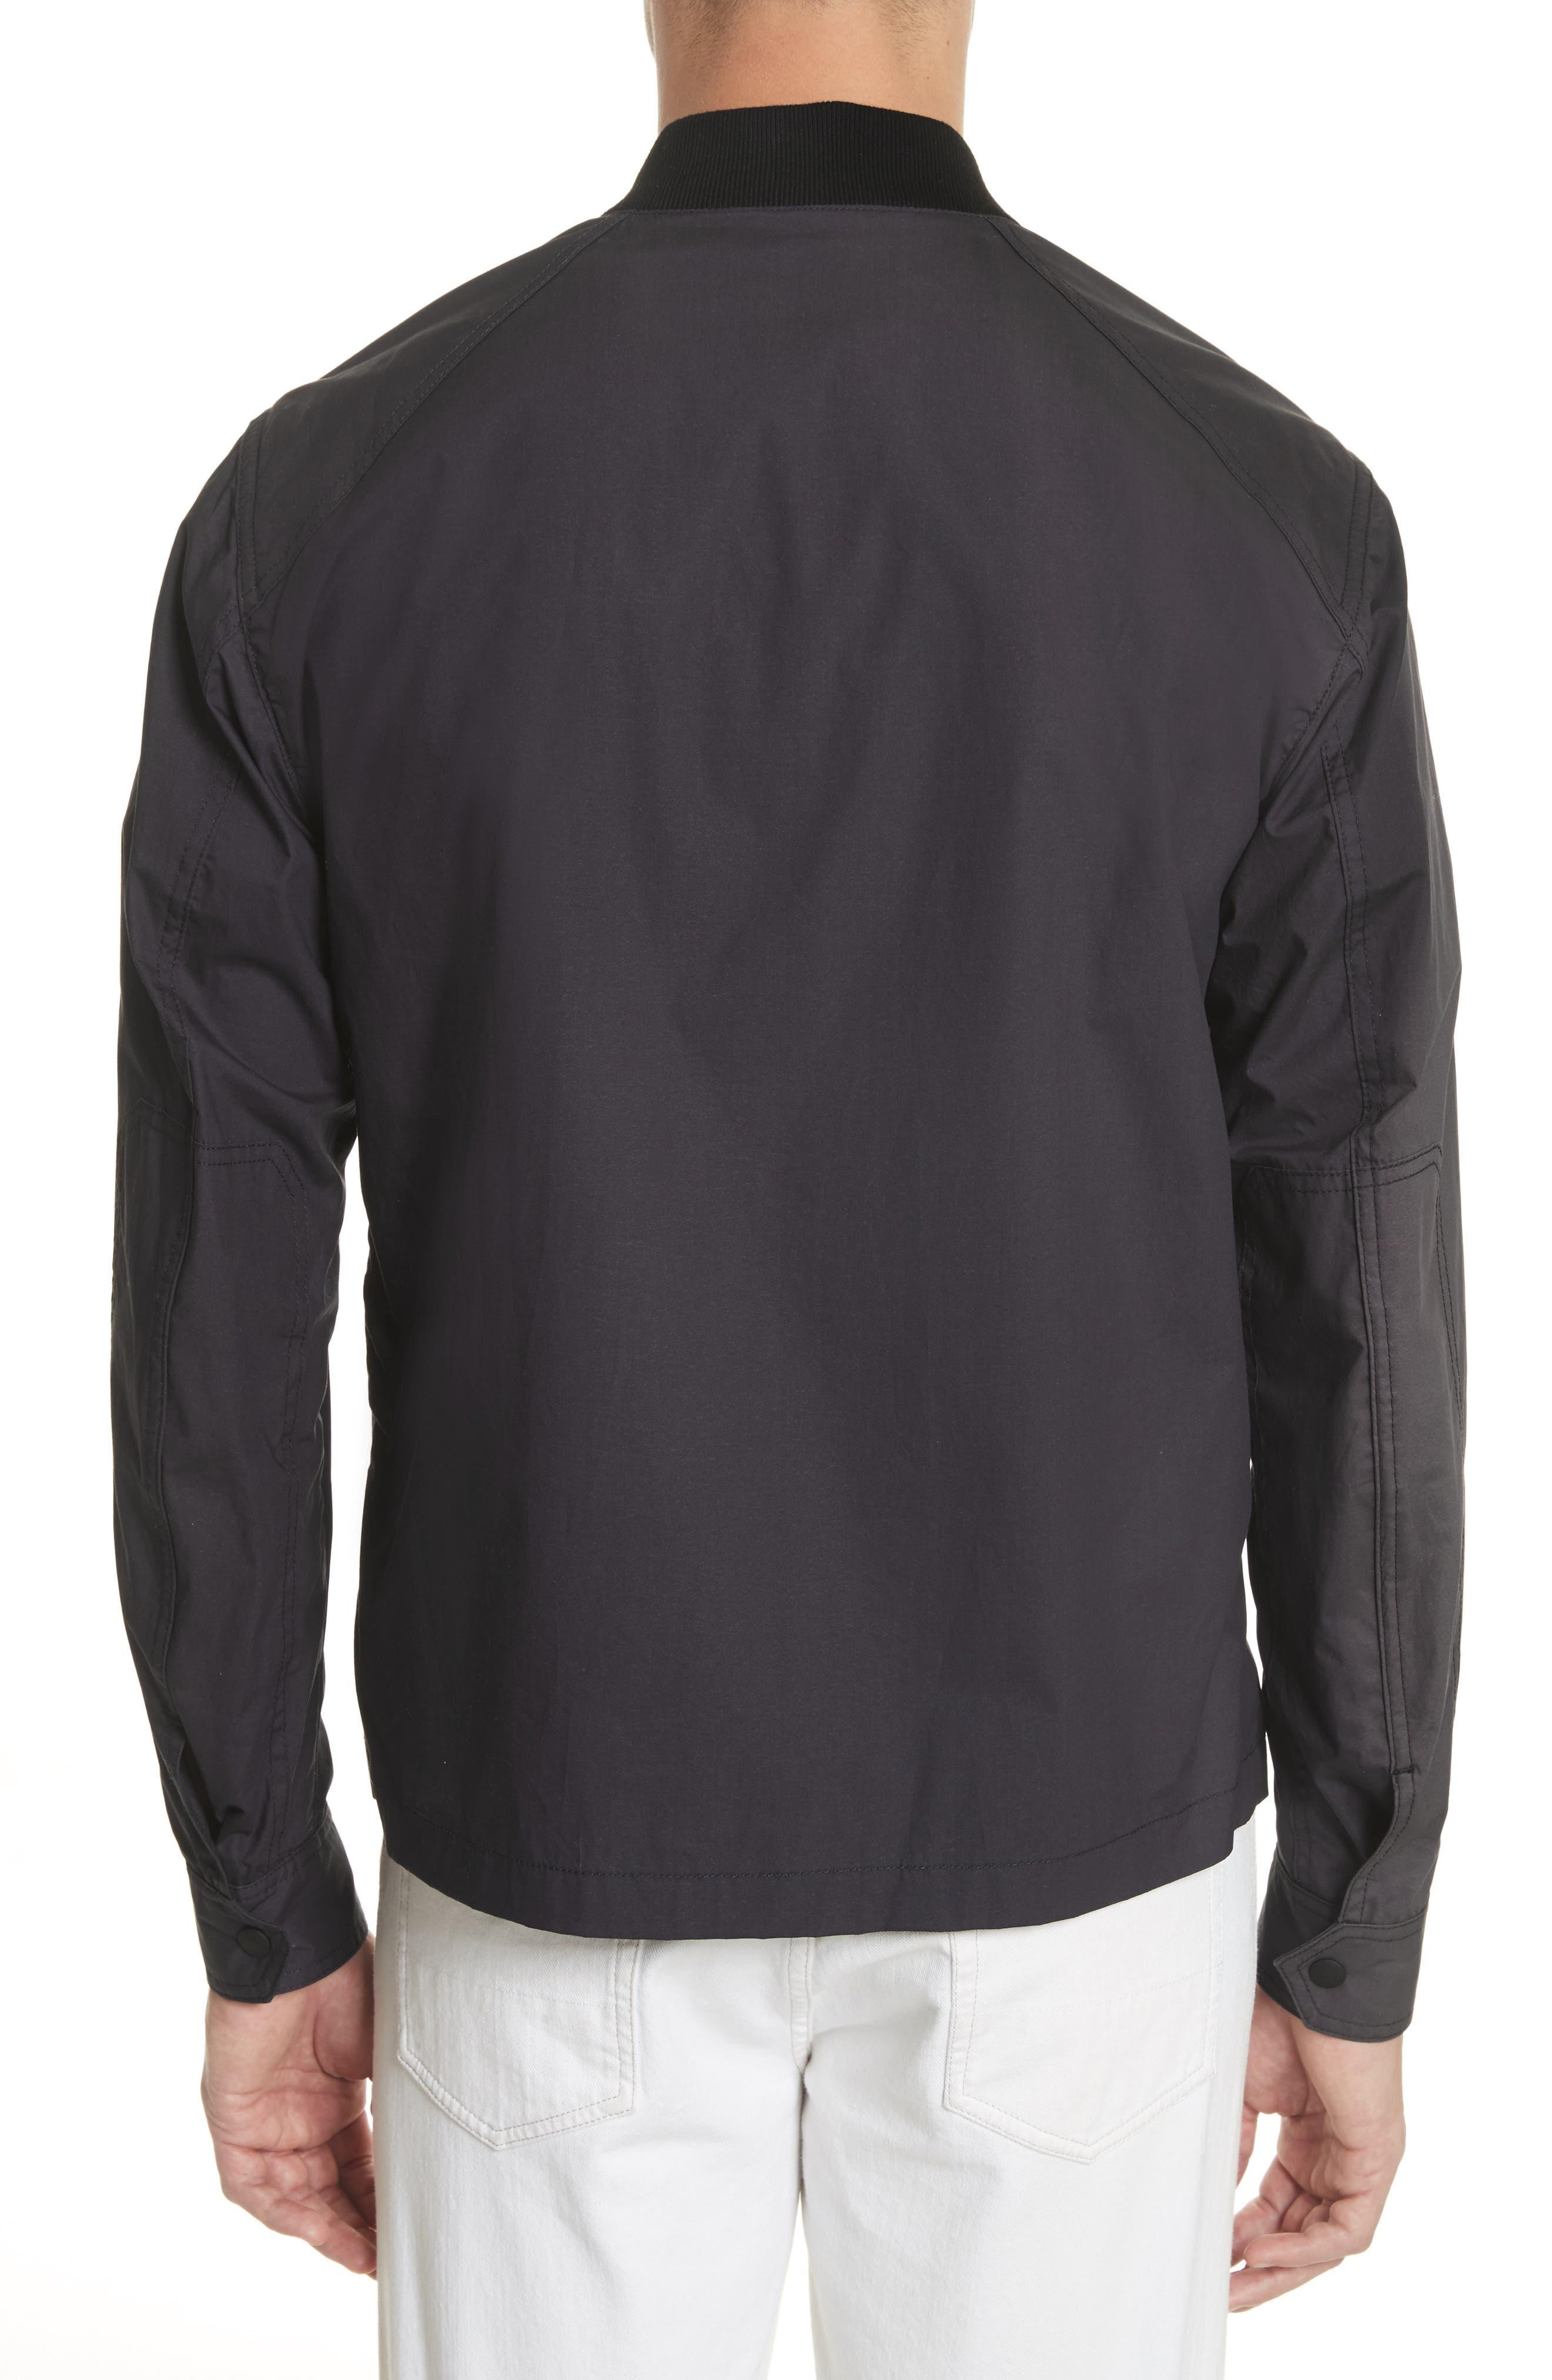 Cardingham Jacket,                             Alternate thumbnail 2, color,                             020